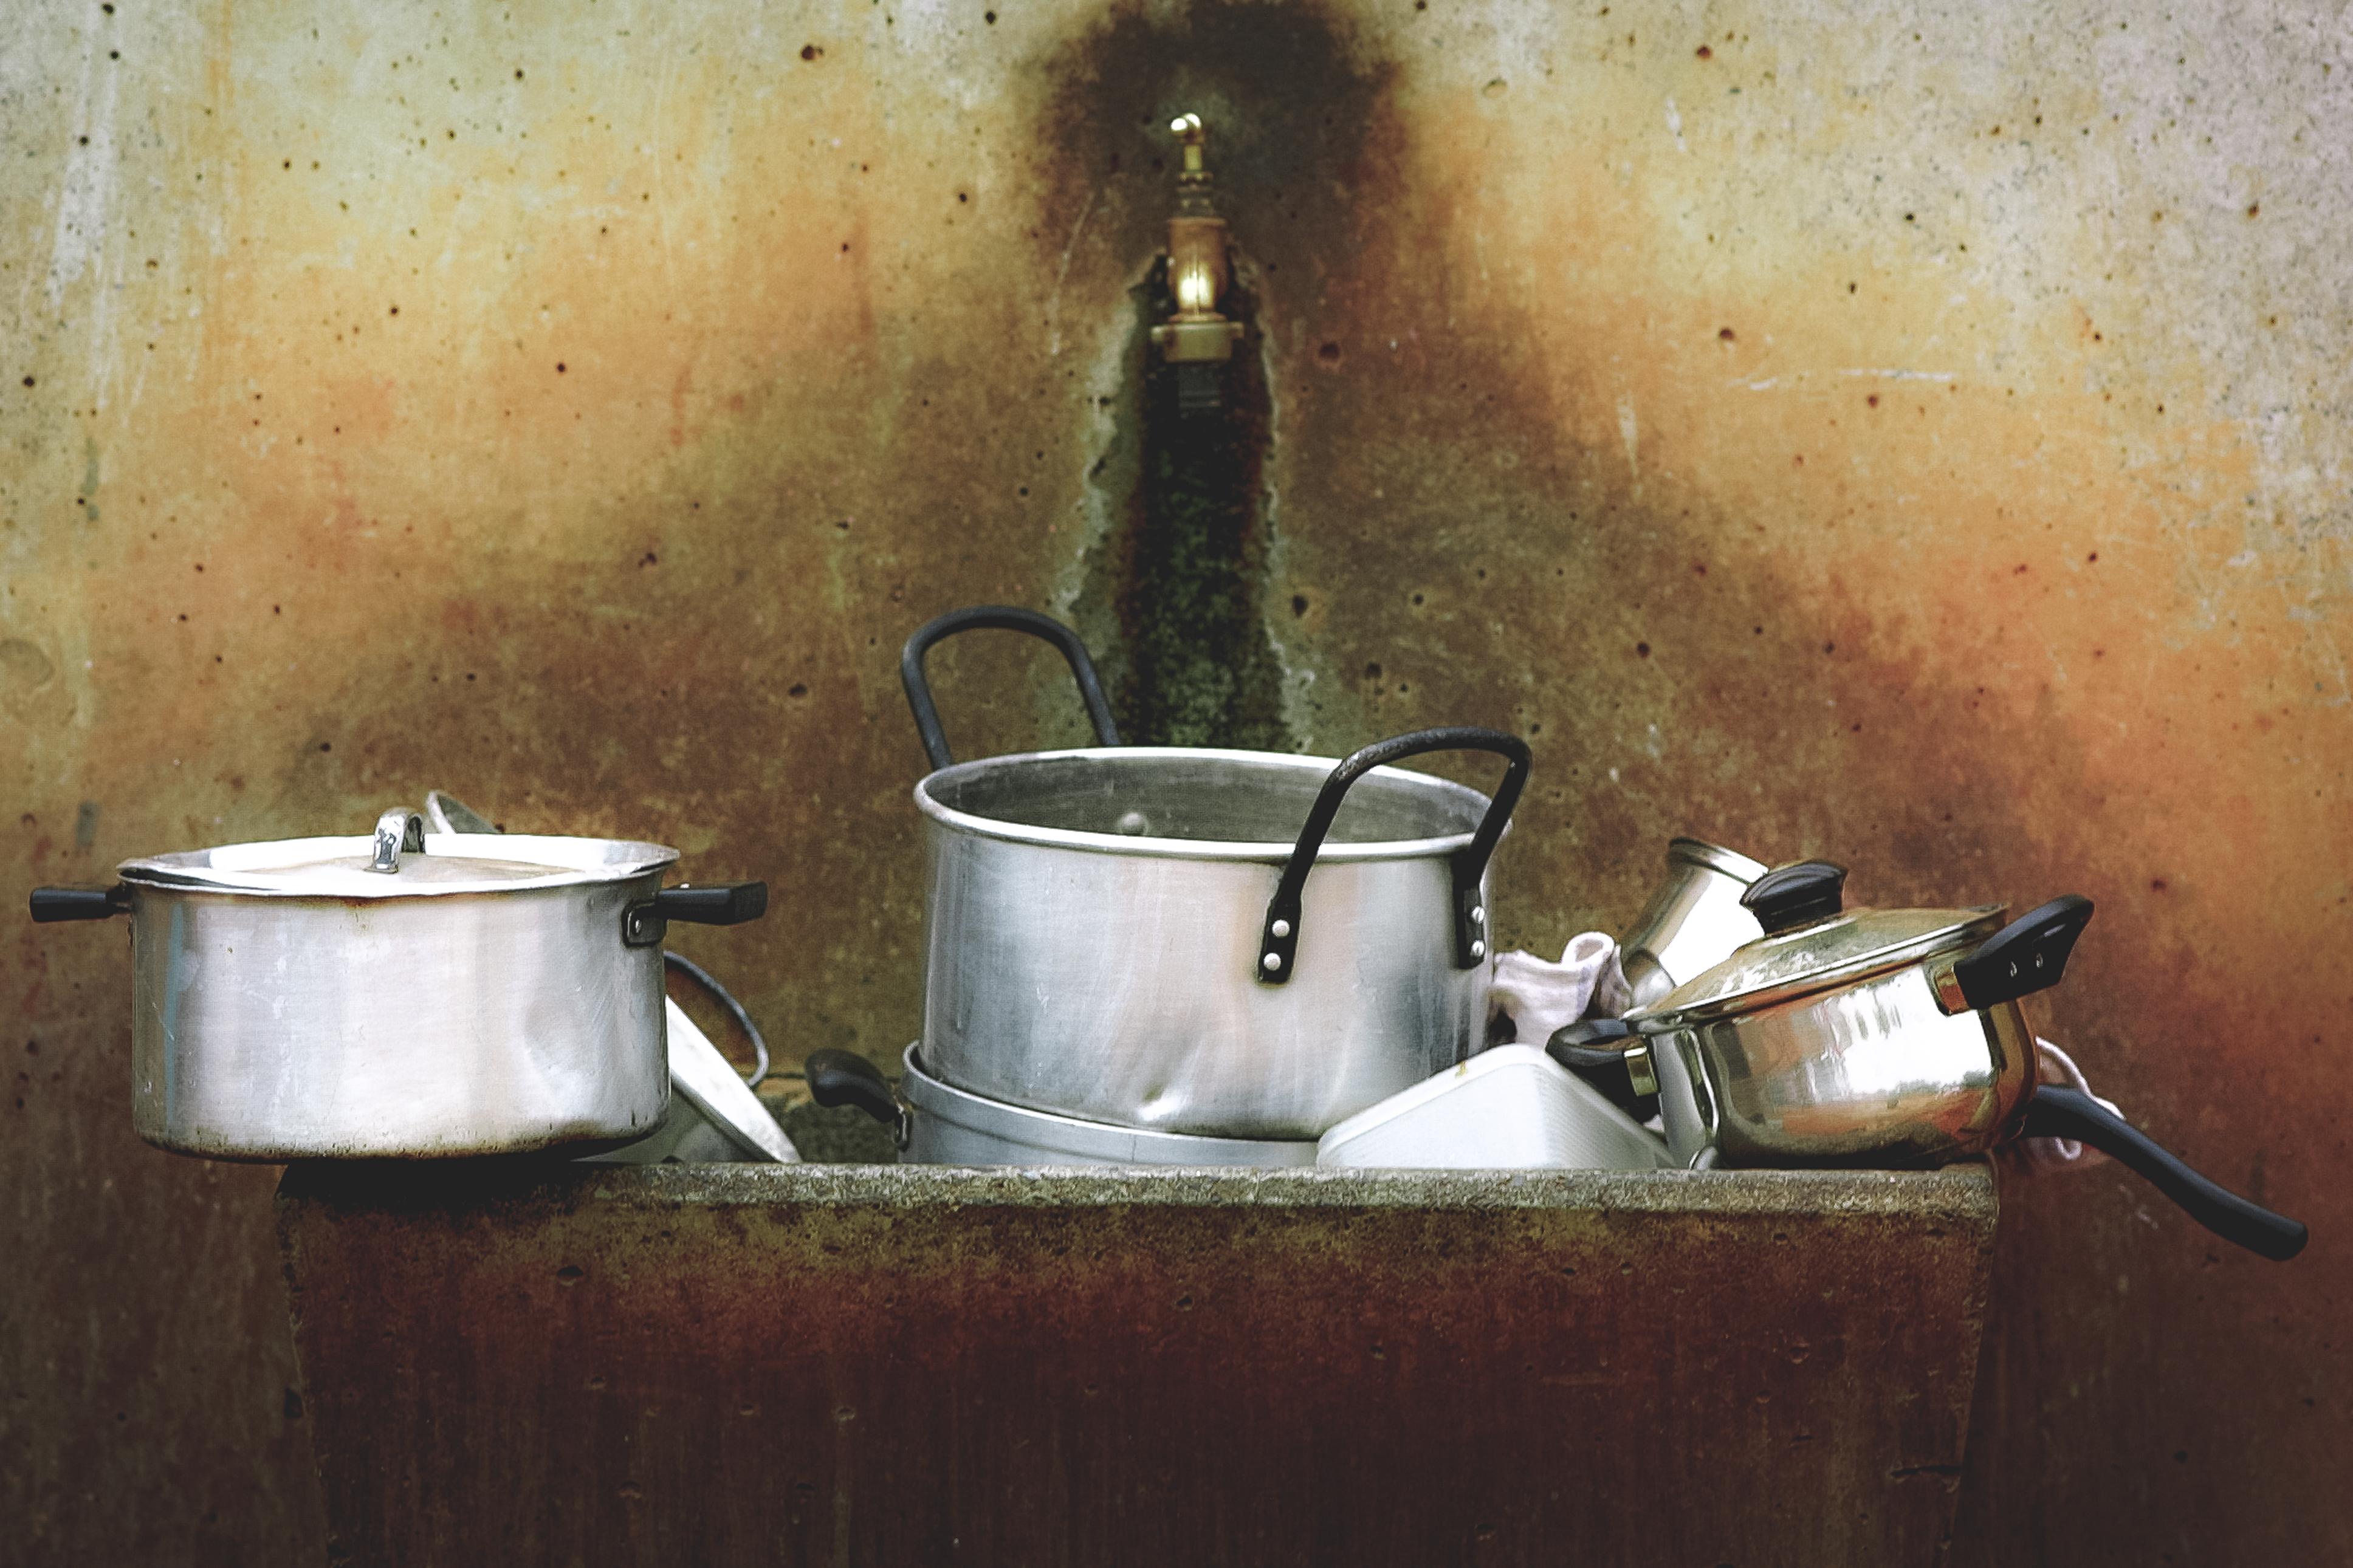 fregadero para tu hogar que debes limpiar ya que se acumulan bacterias